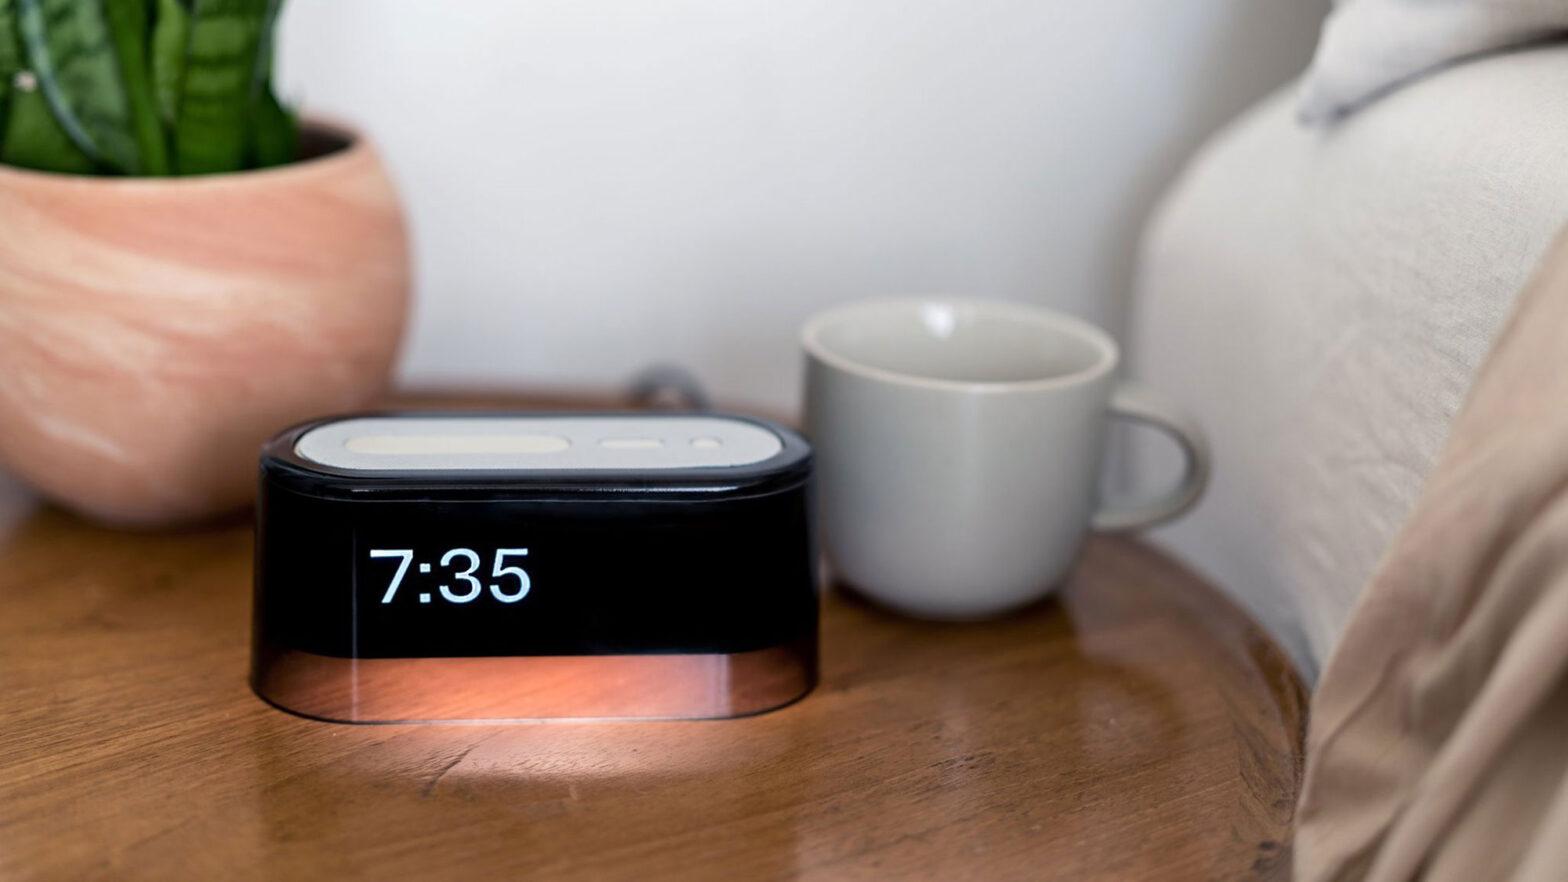 The Loftie Alarm Clock